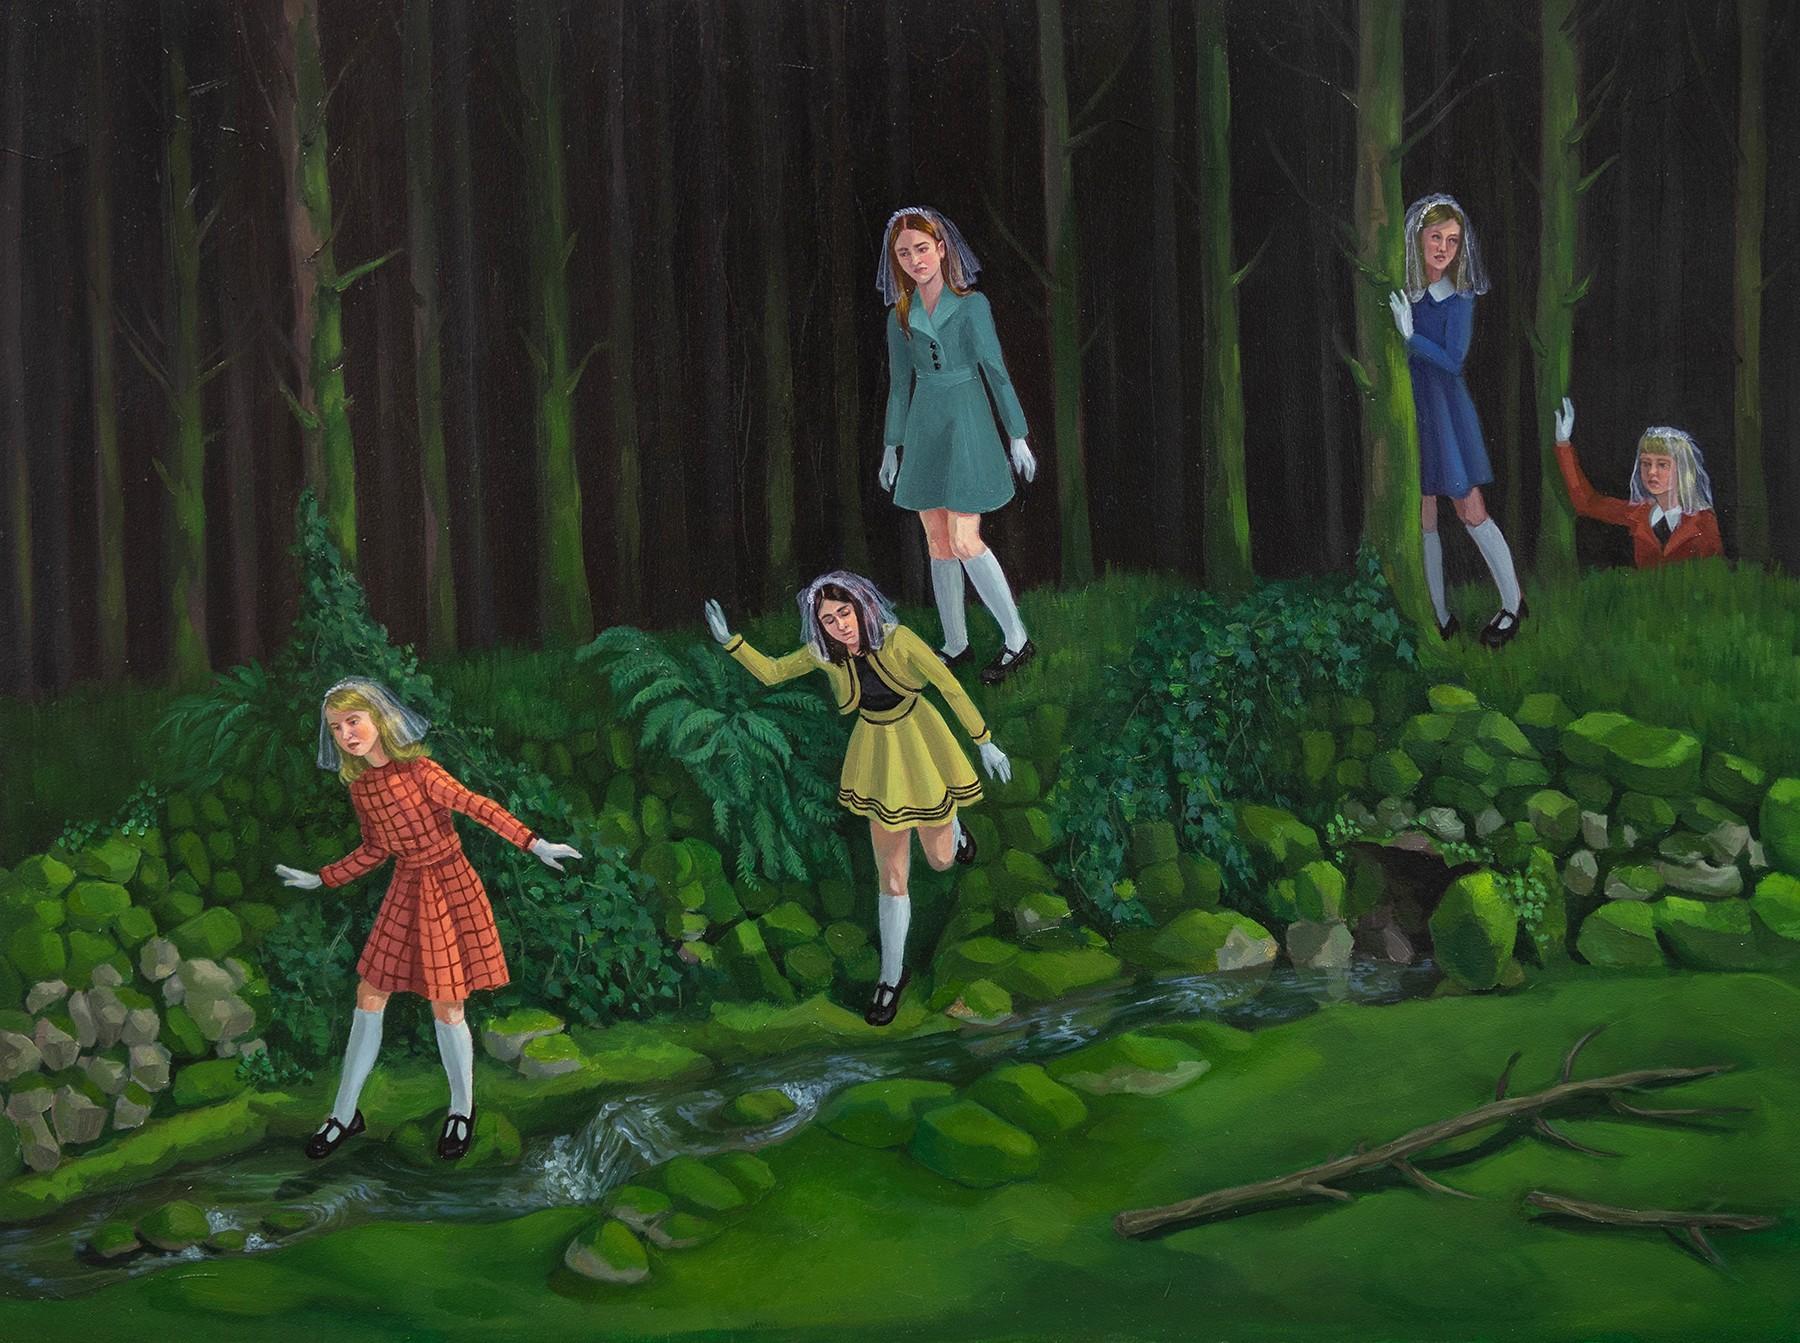 Zoe Hawk's Paintings Celebrate Feminine Identity 4